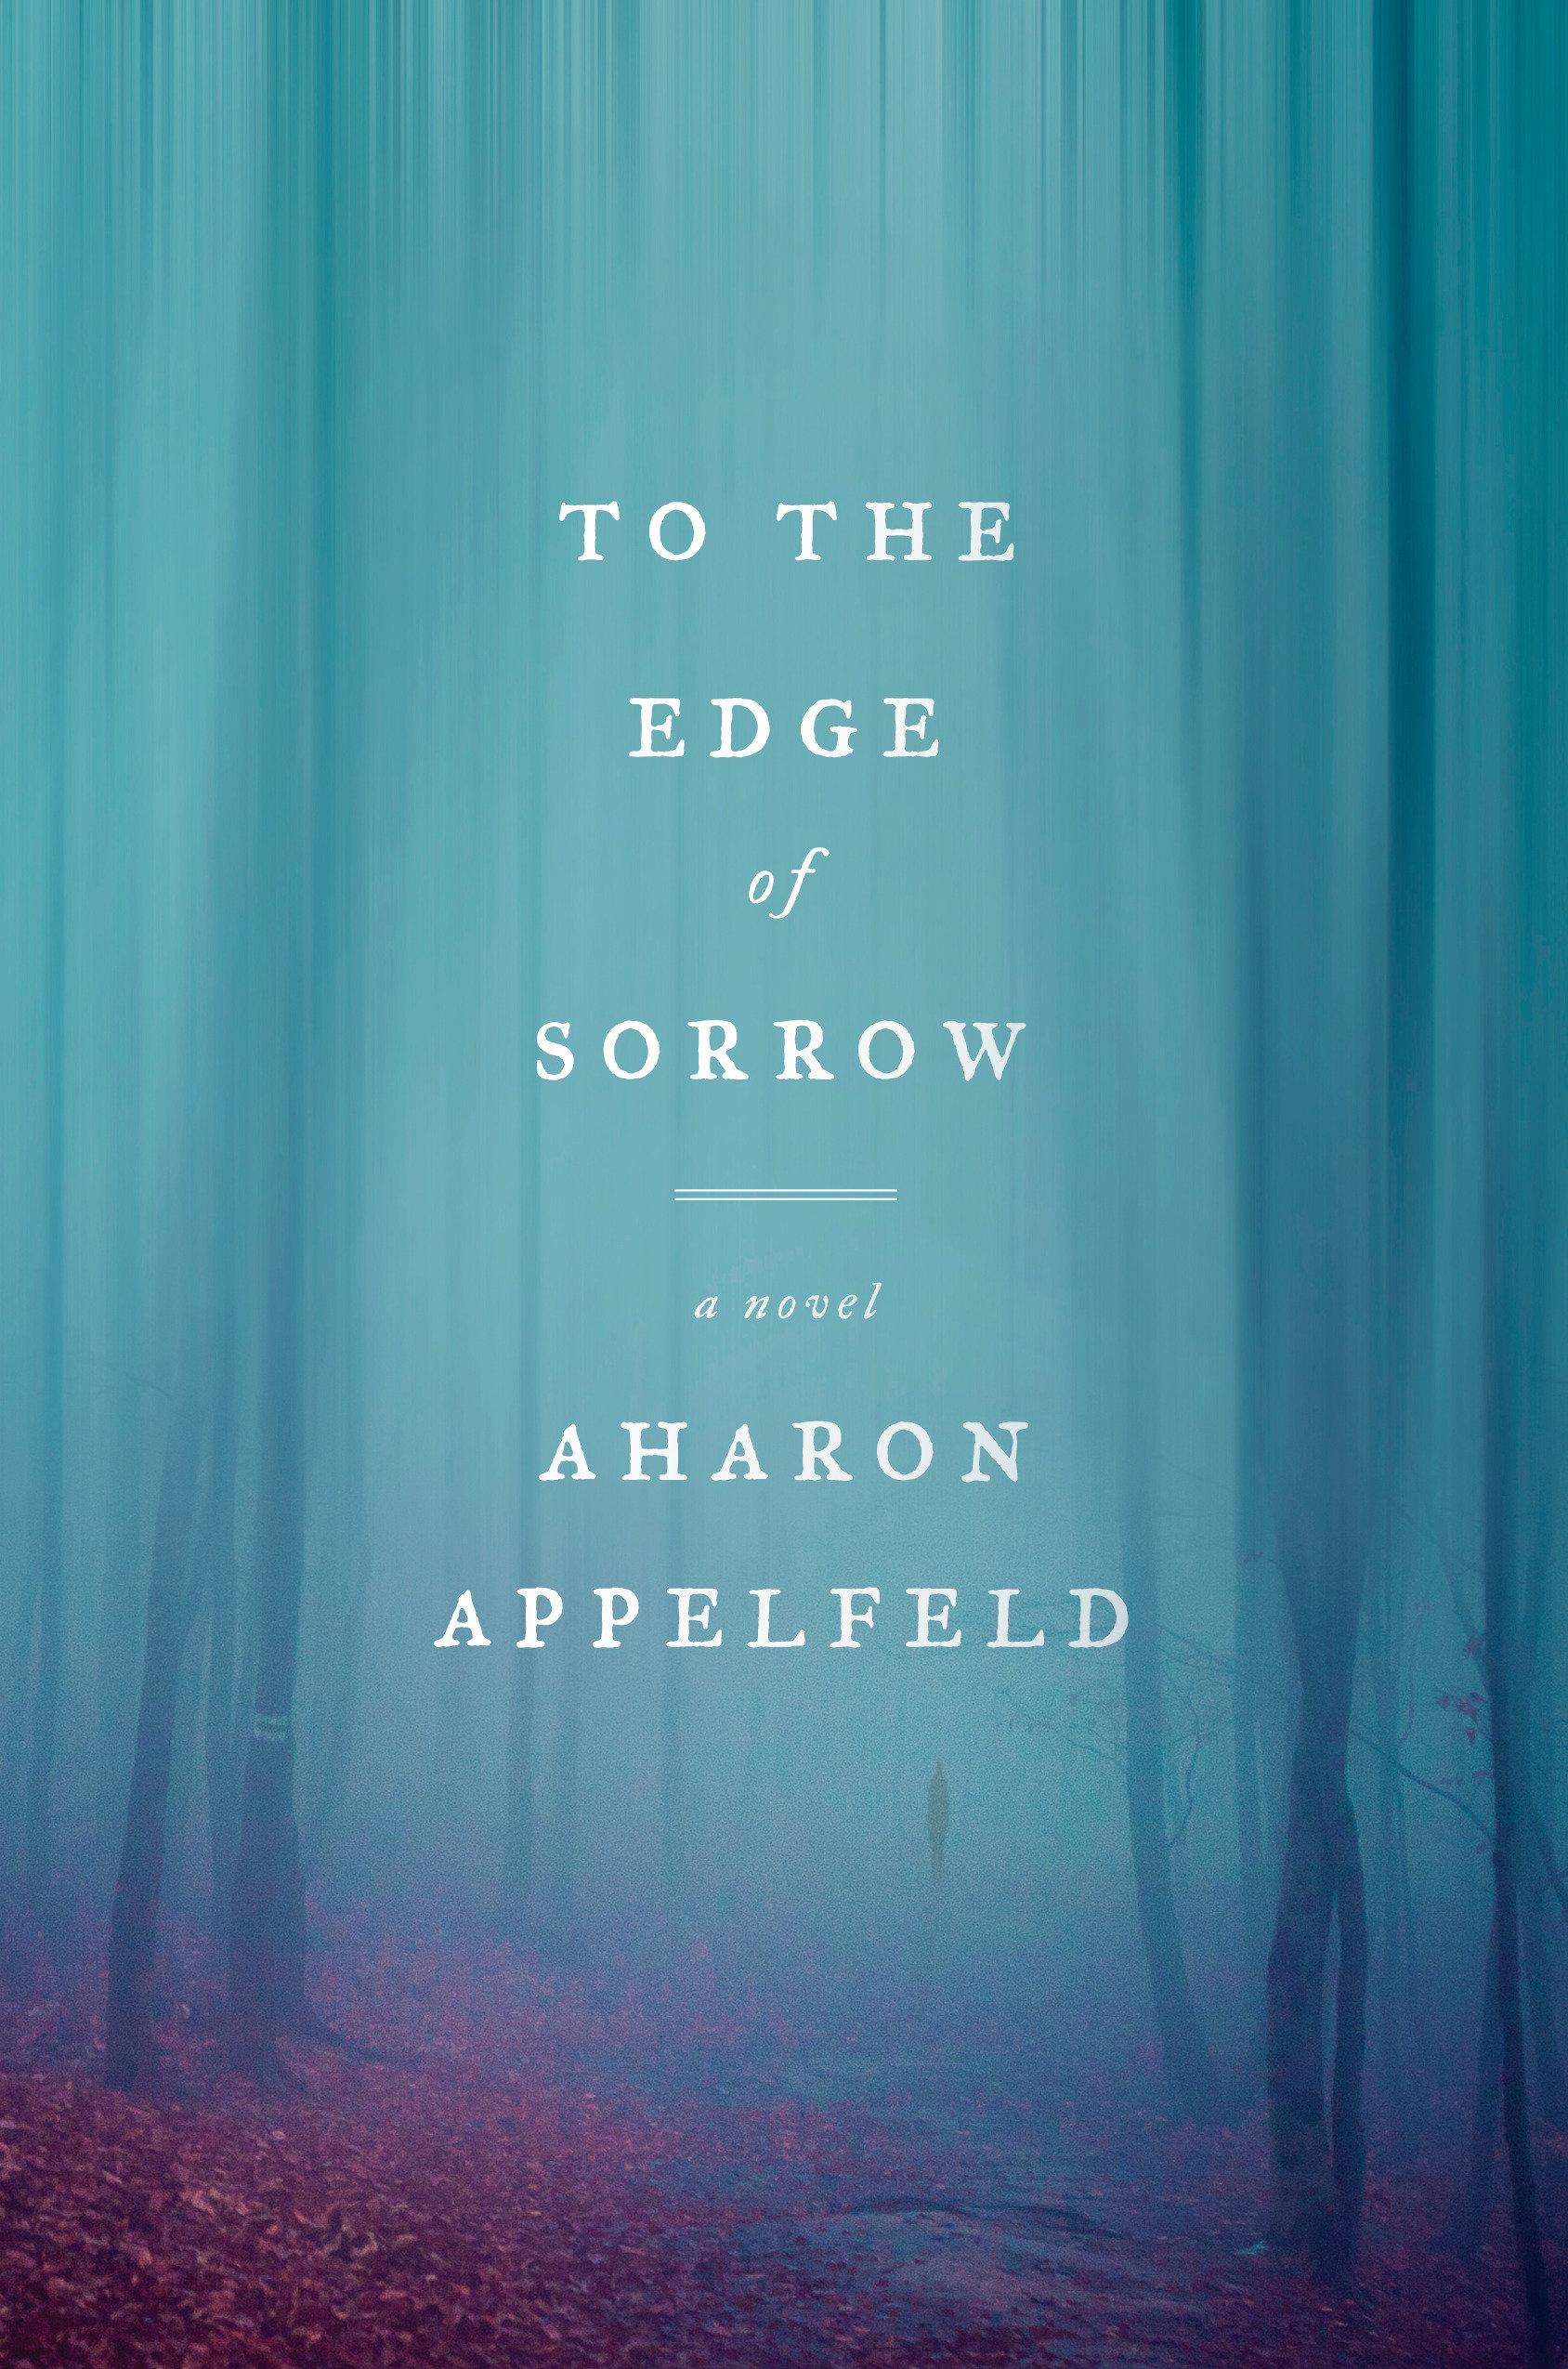 To the Edge of Sorrow A Novel